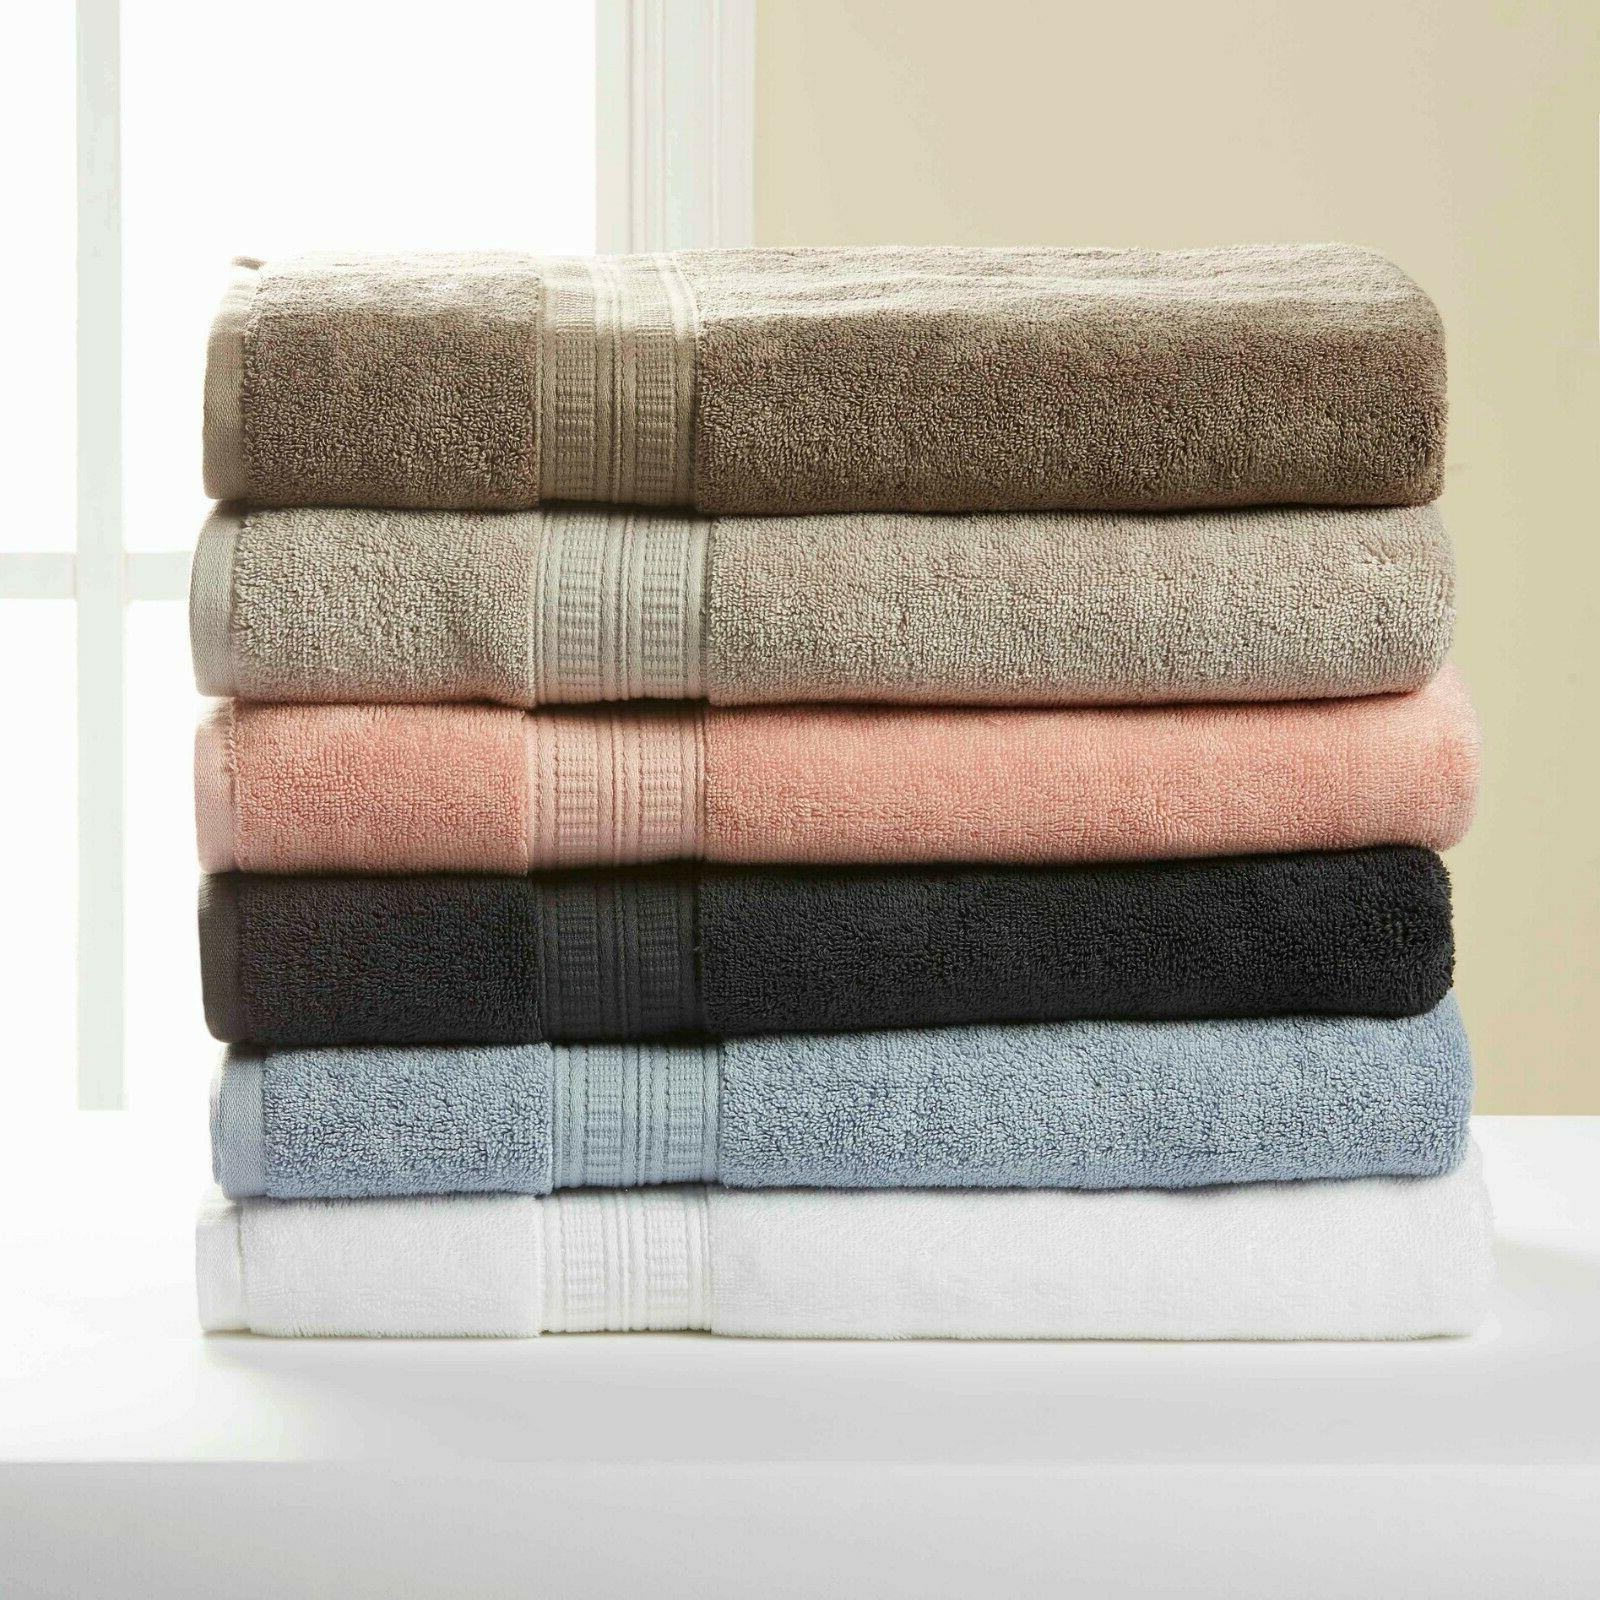 "5 Towel Sheet 35""x68"", Towels 2 Washcloths"